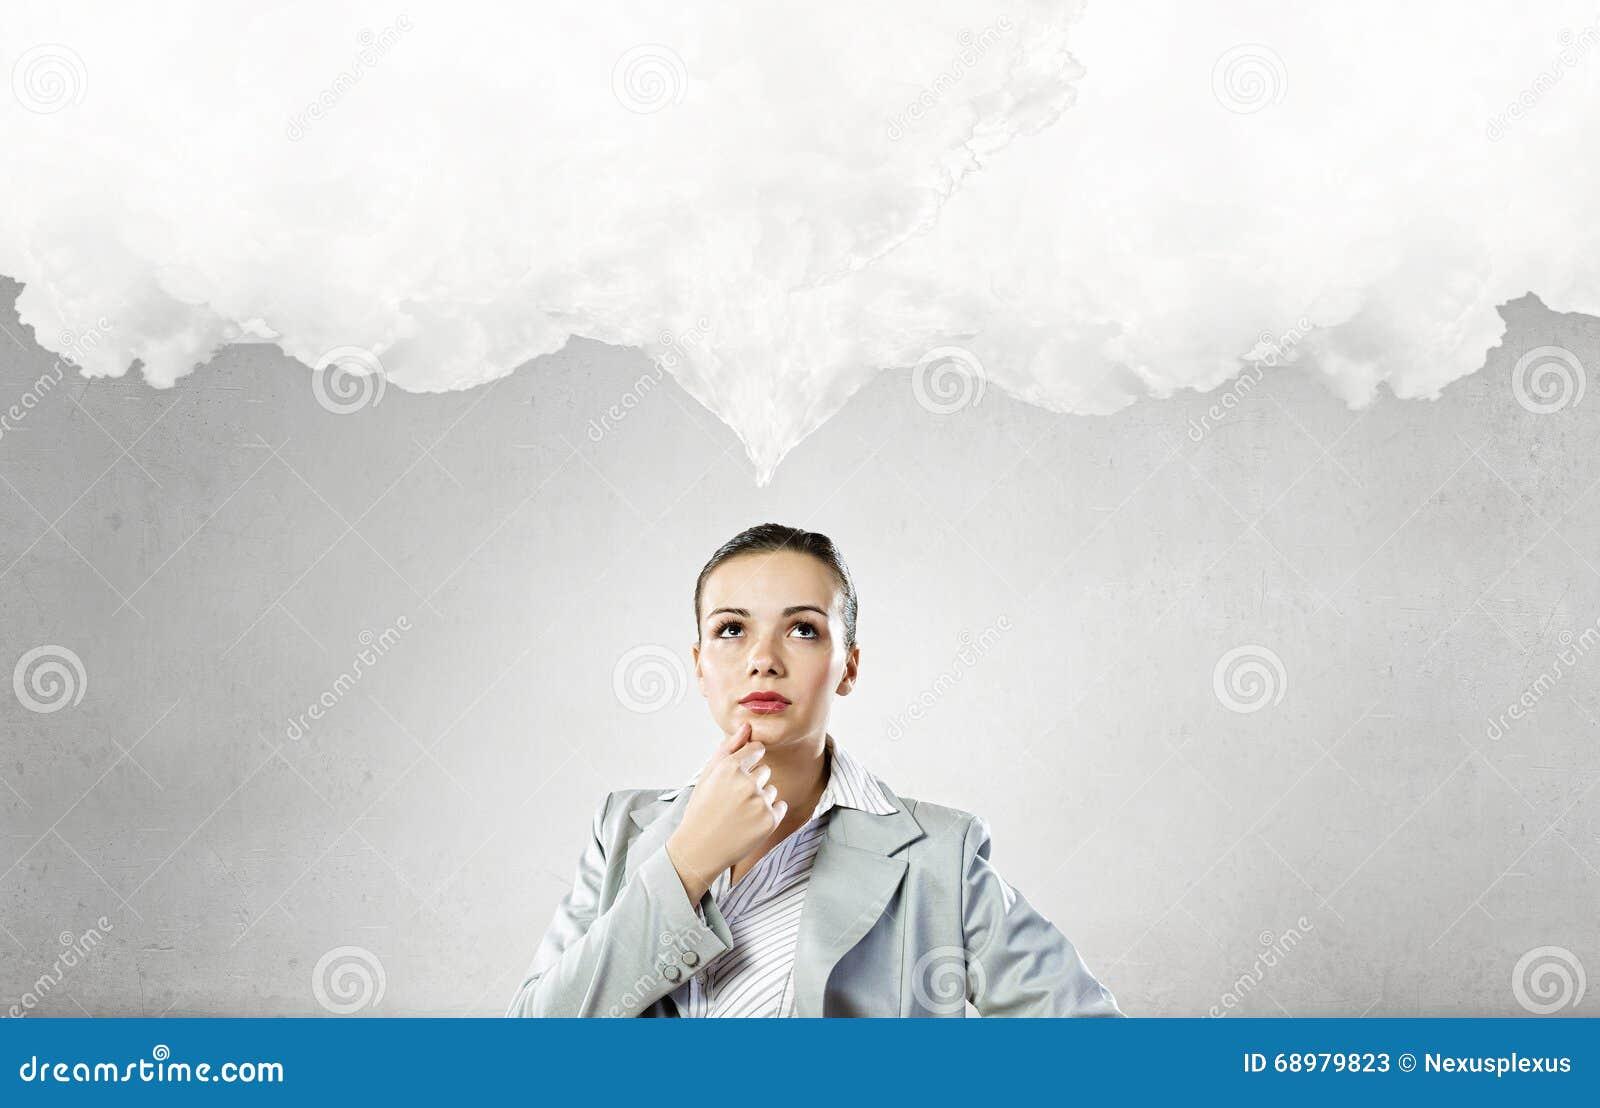 Donna pensierosa ed i suoi pensieri